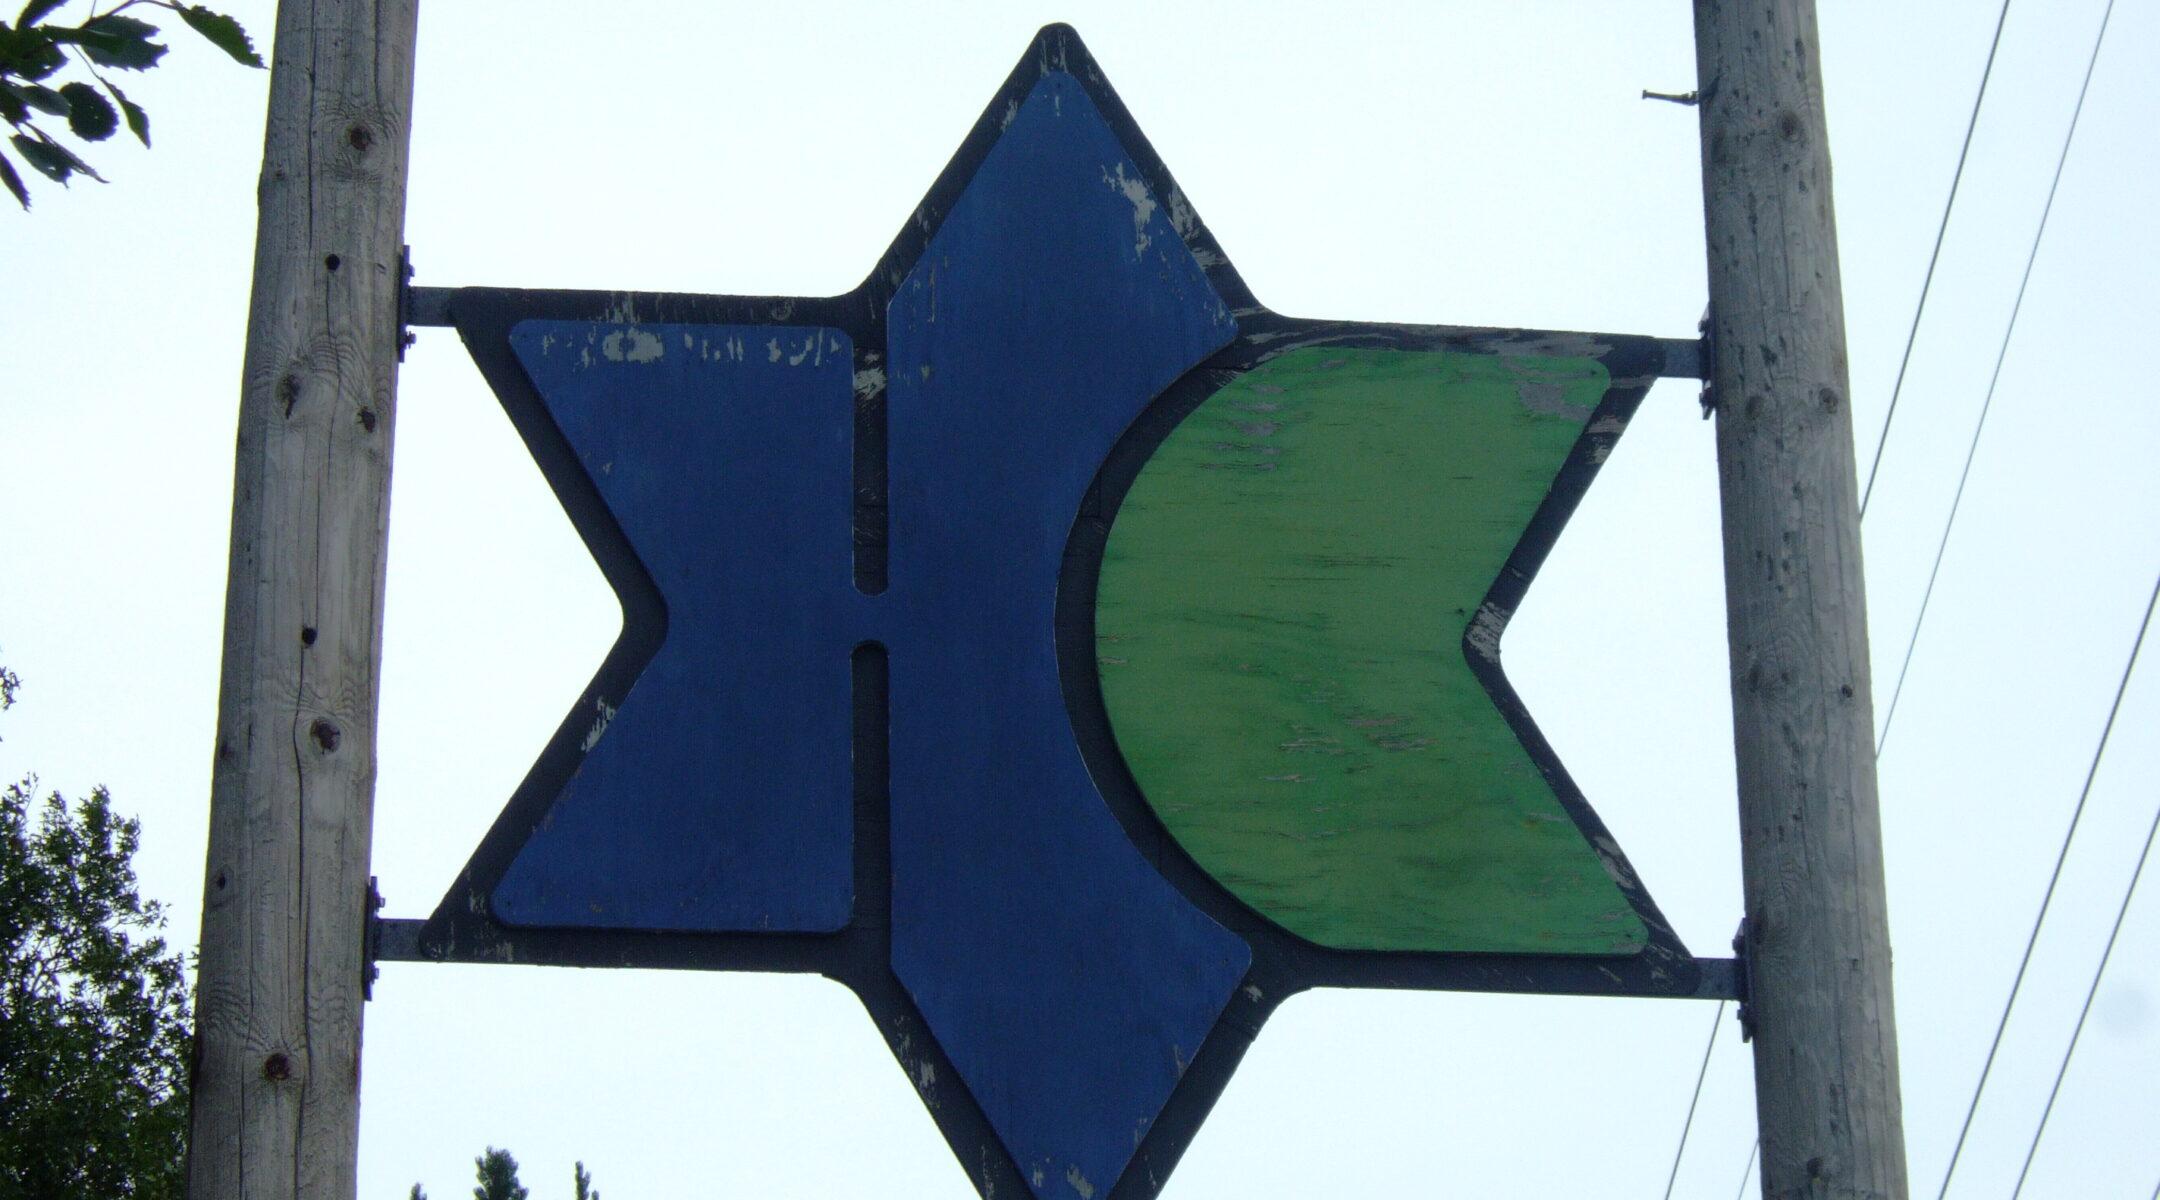 Jewish Star sign at Herzl Camp entrance